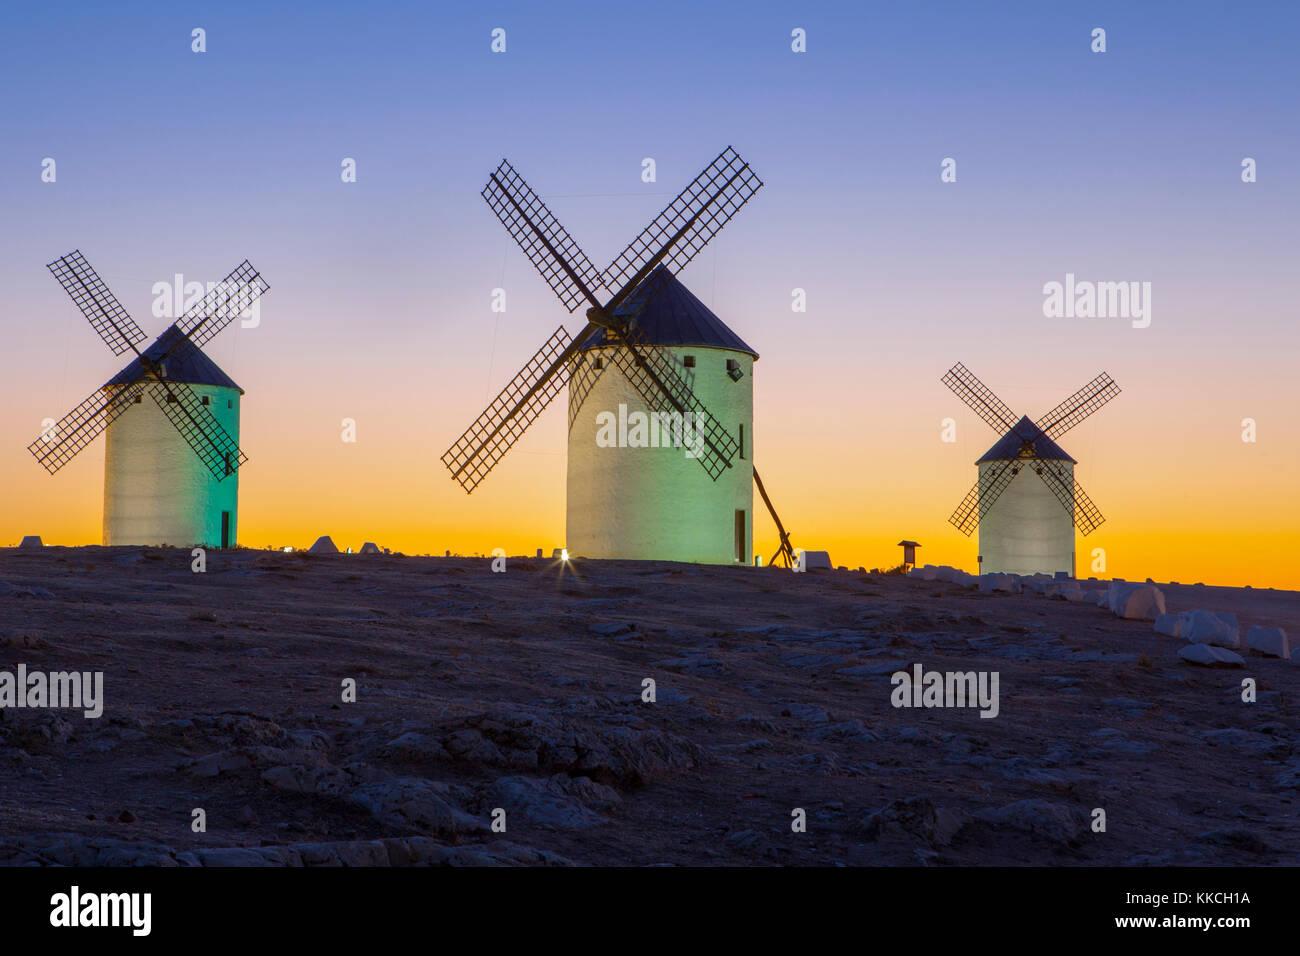 Illumintaed traditional windmills at rising, Campo de Criptana, Spain - Stock Image